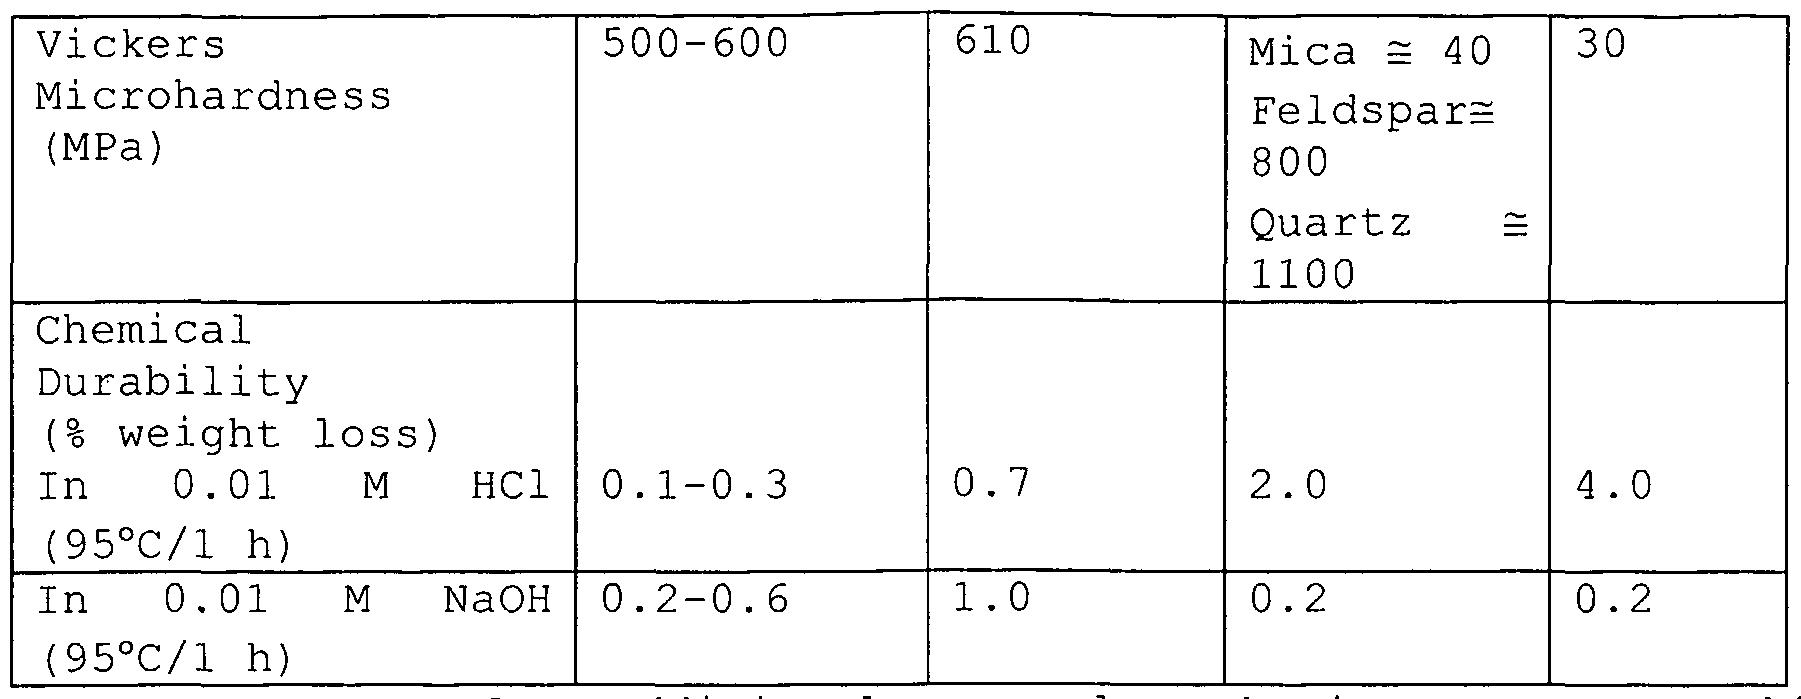 eft weight loss gary craig pdf